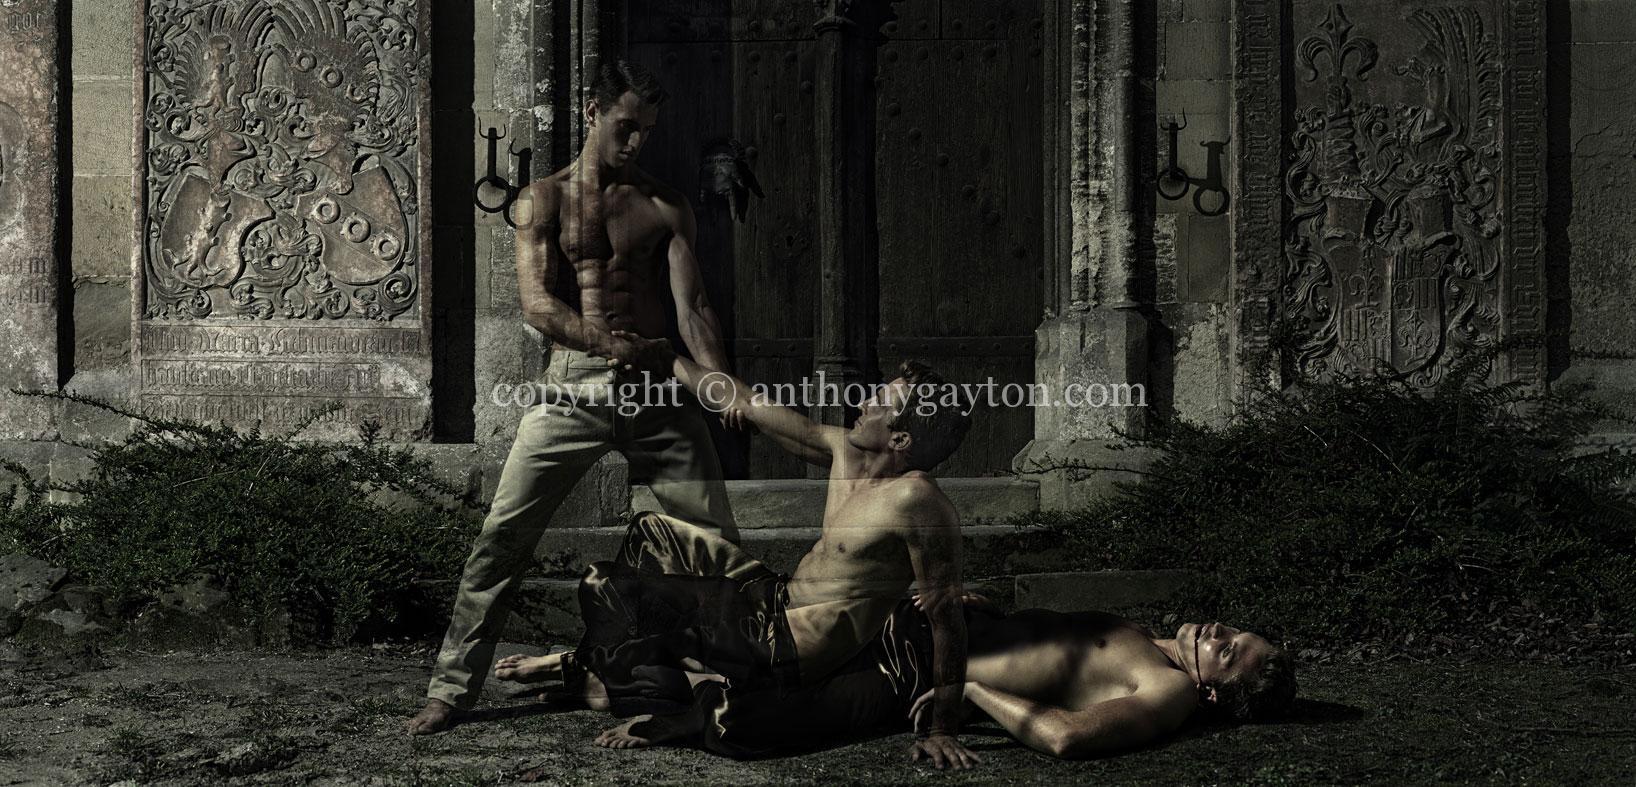 09_The_Resurrection_Copyright_Anthony_Gayton